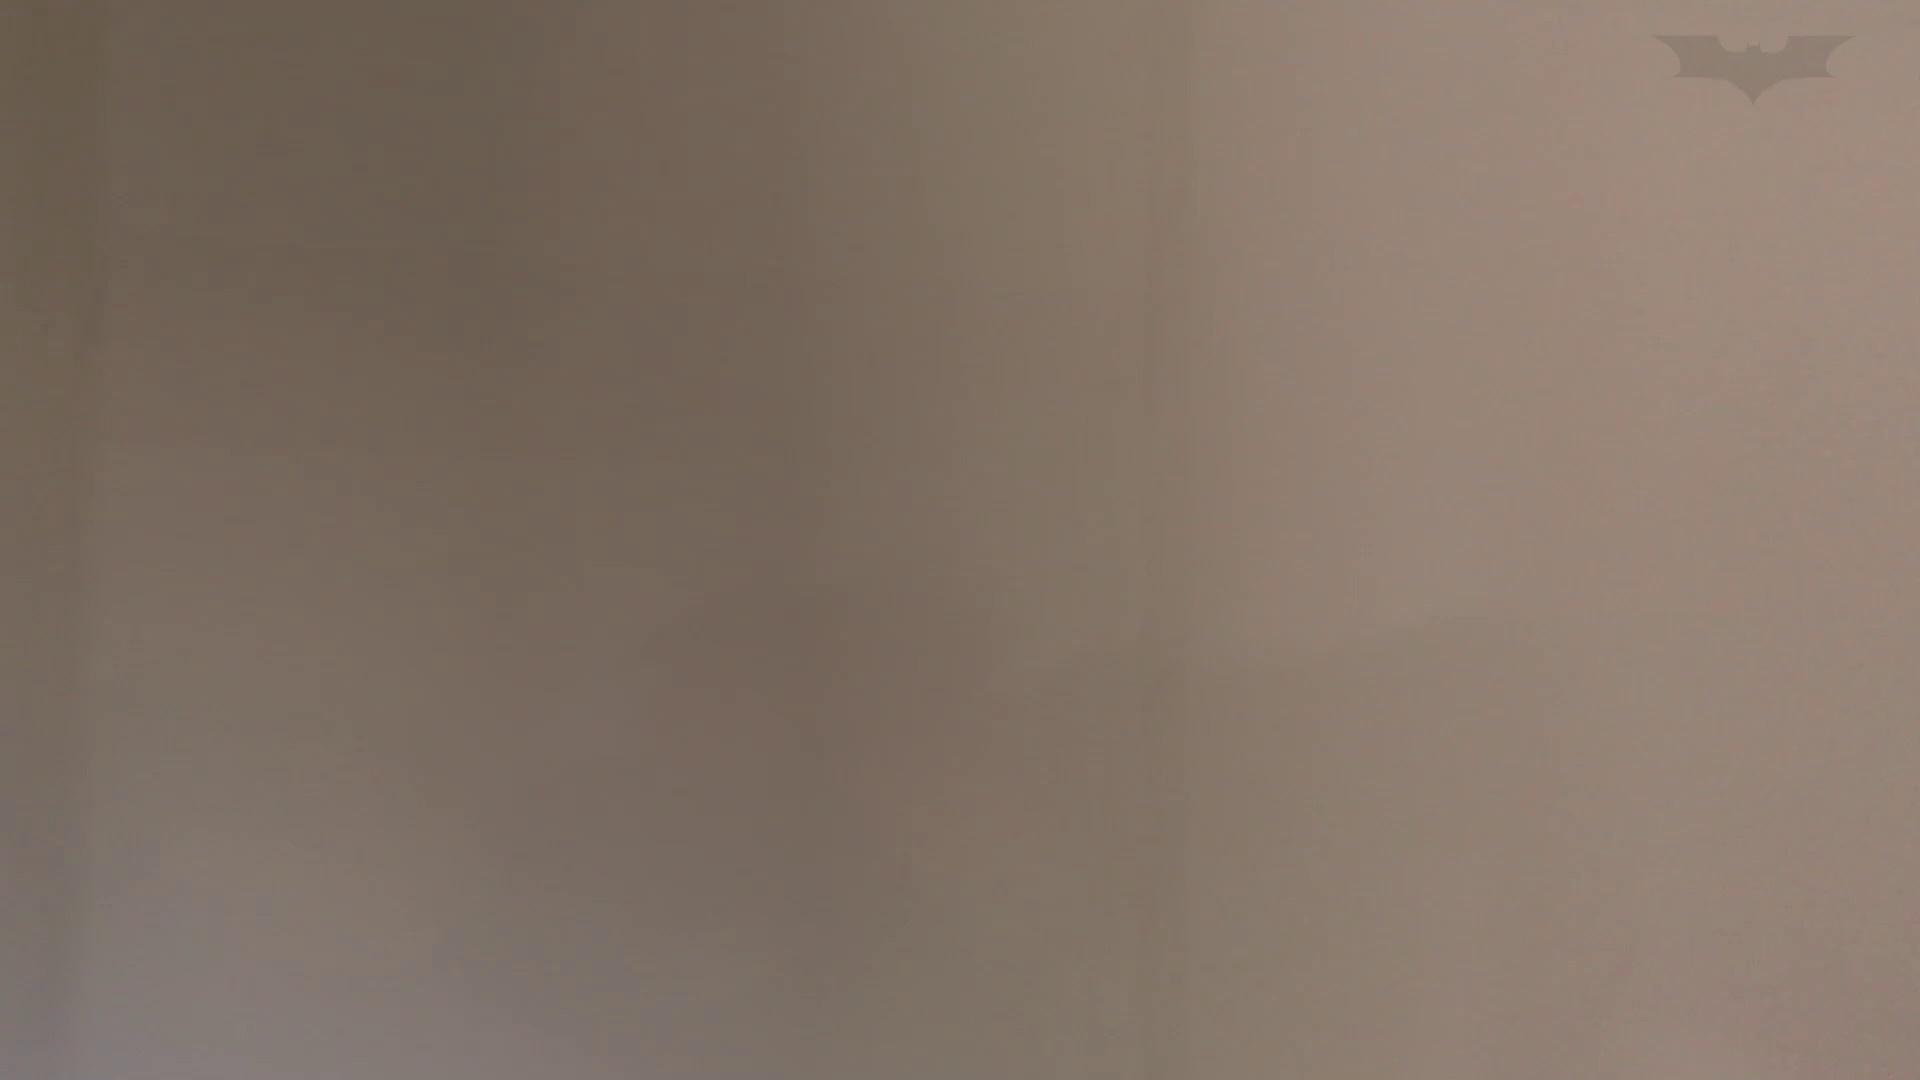 芸術大学ガチ潜入盗撮 JD盗撮 美女の洗面所の秘密 Vol.81 潜入  83pic 42